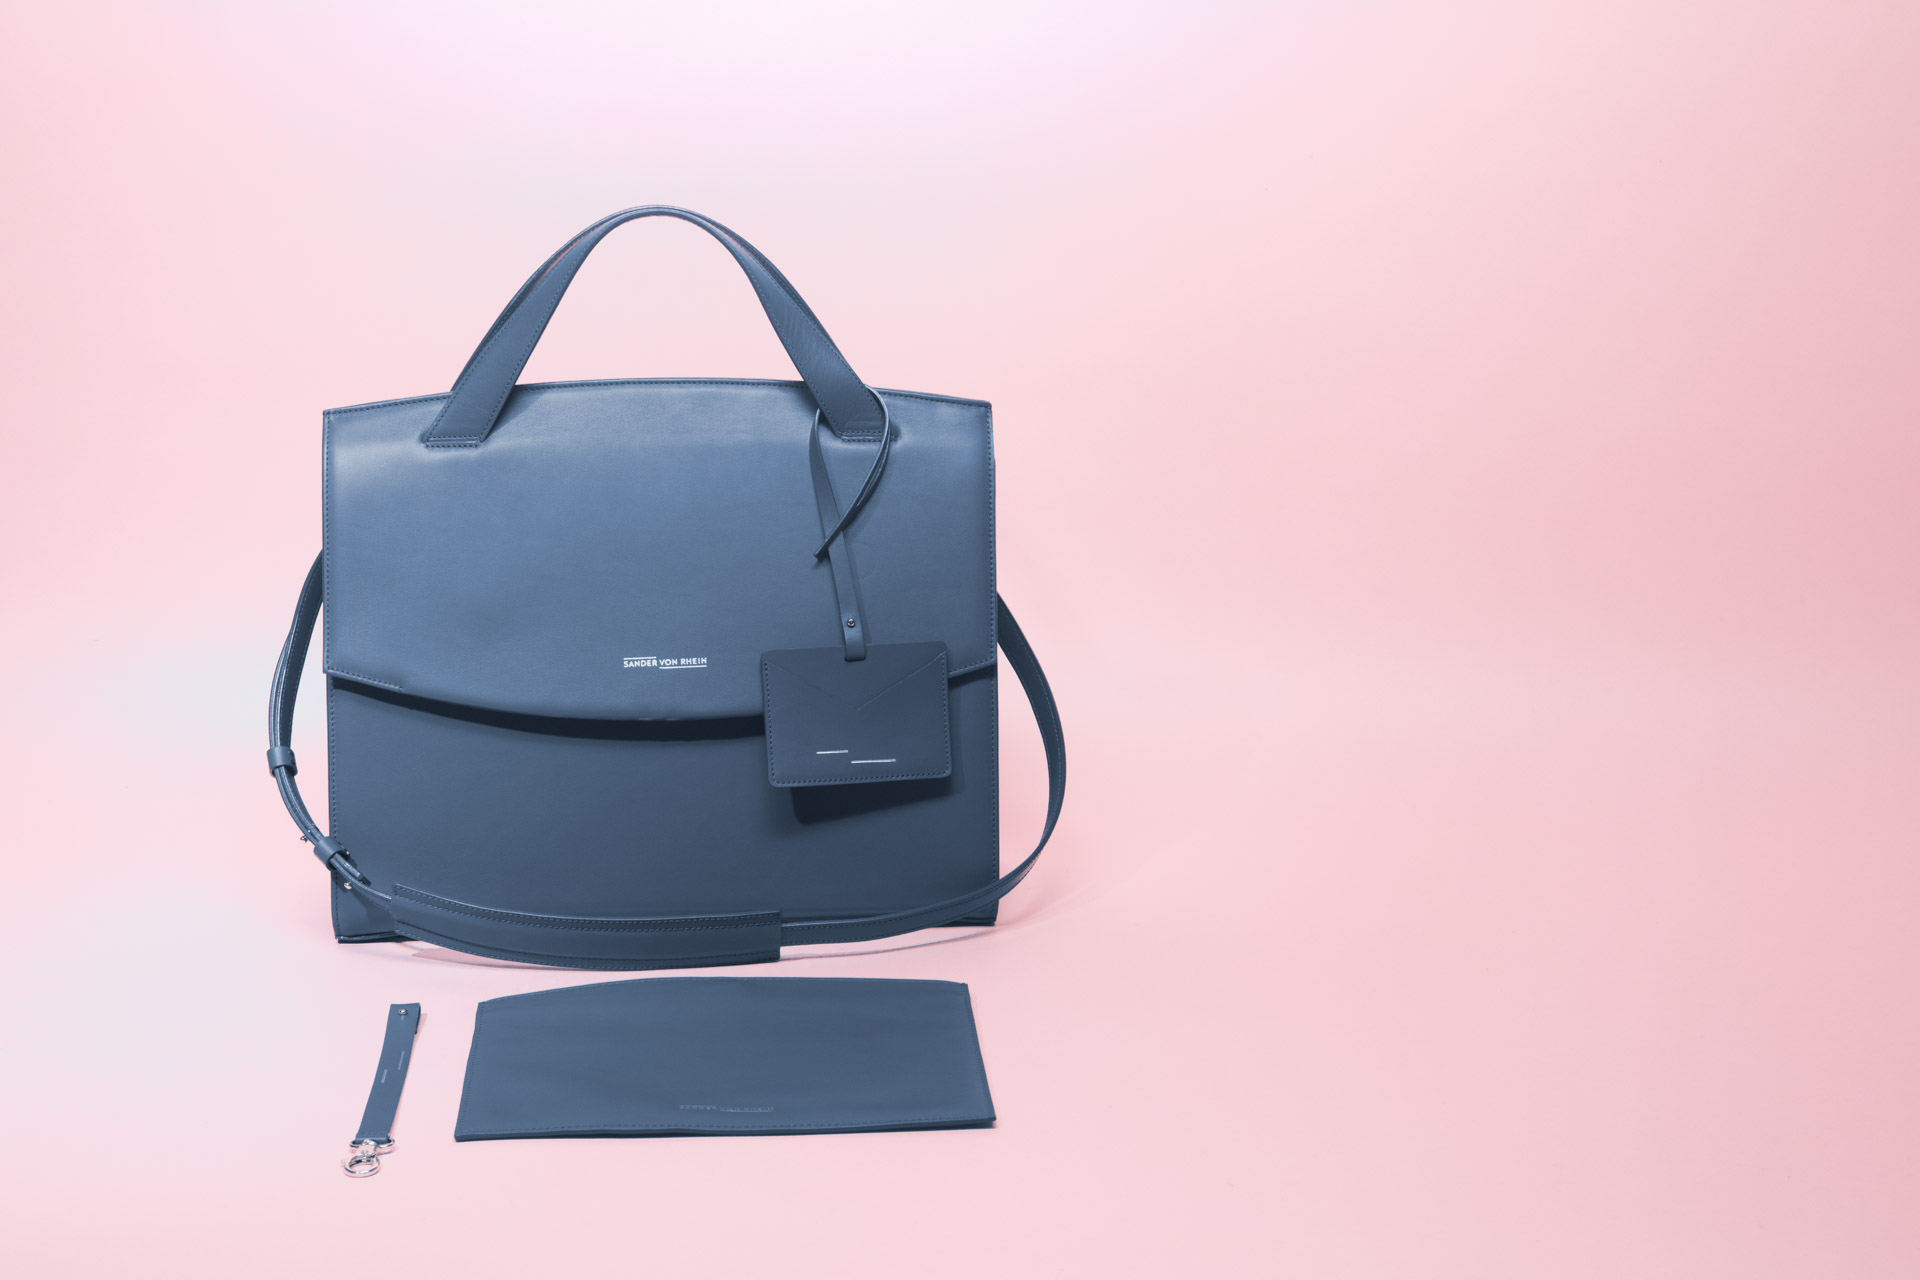 WEB Backup bags shop presentation-92.jpg